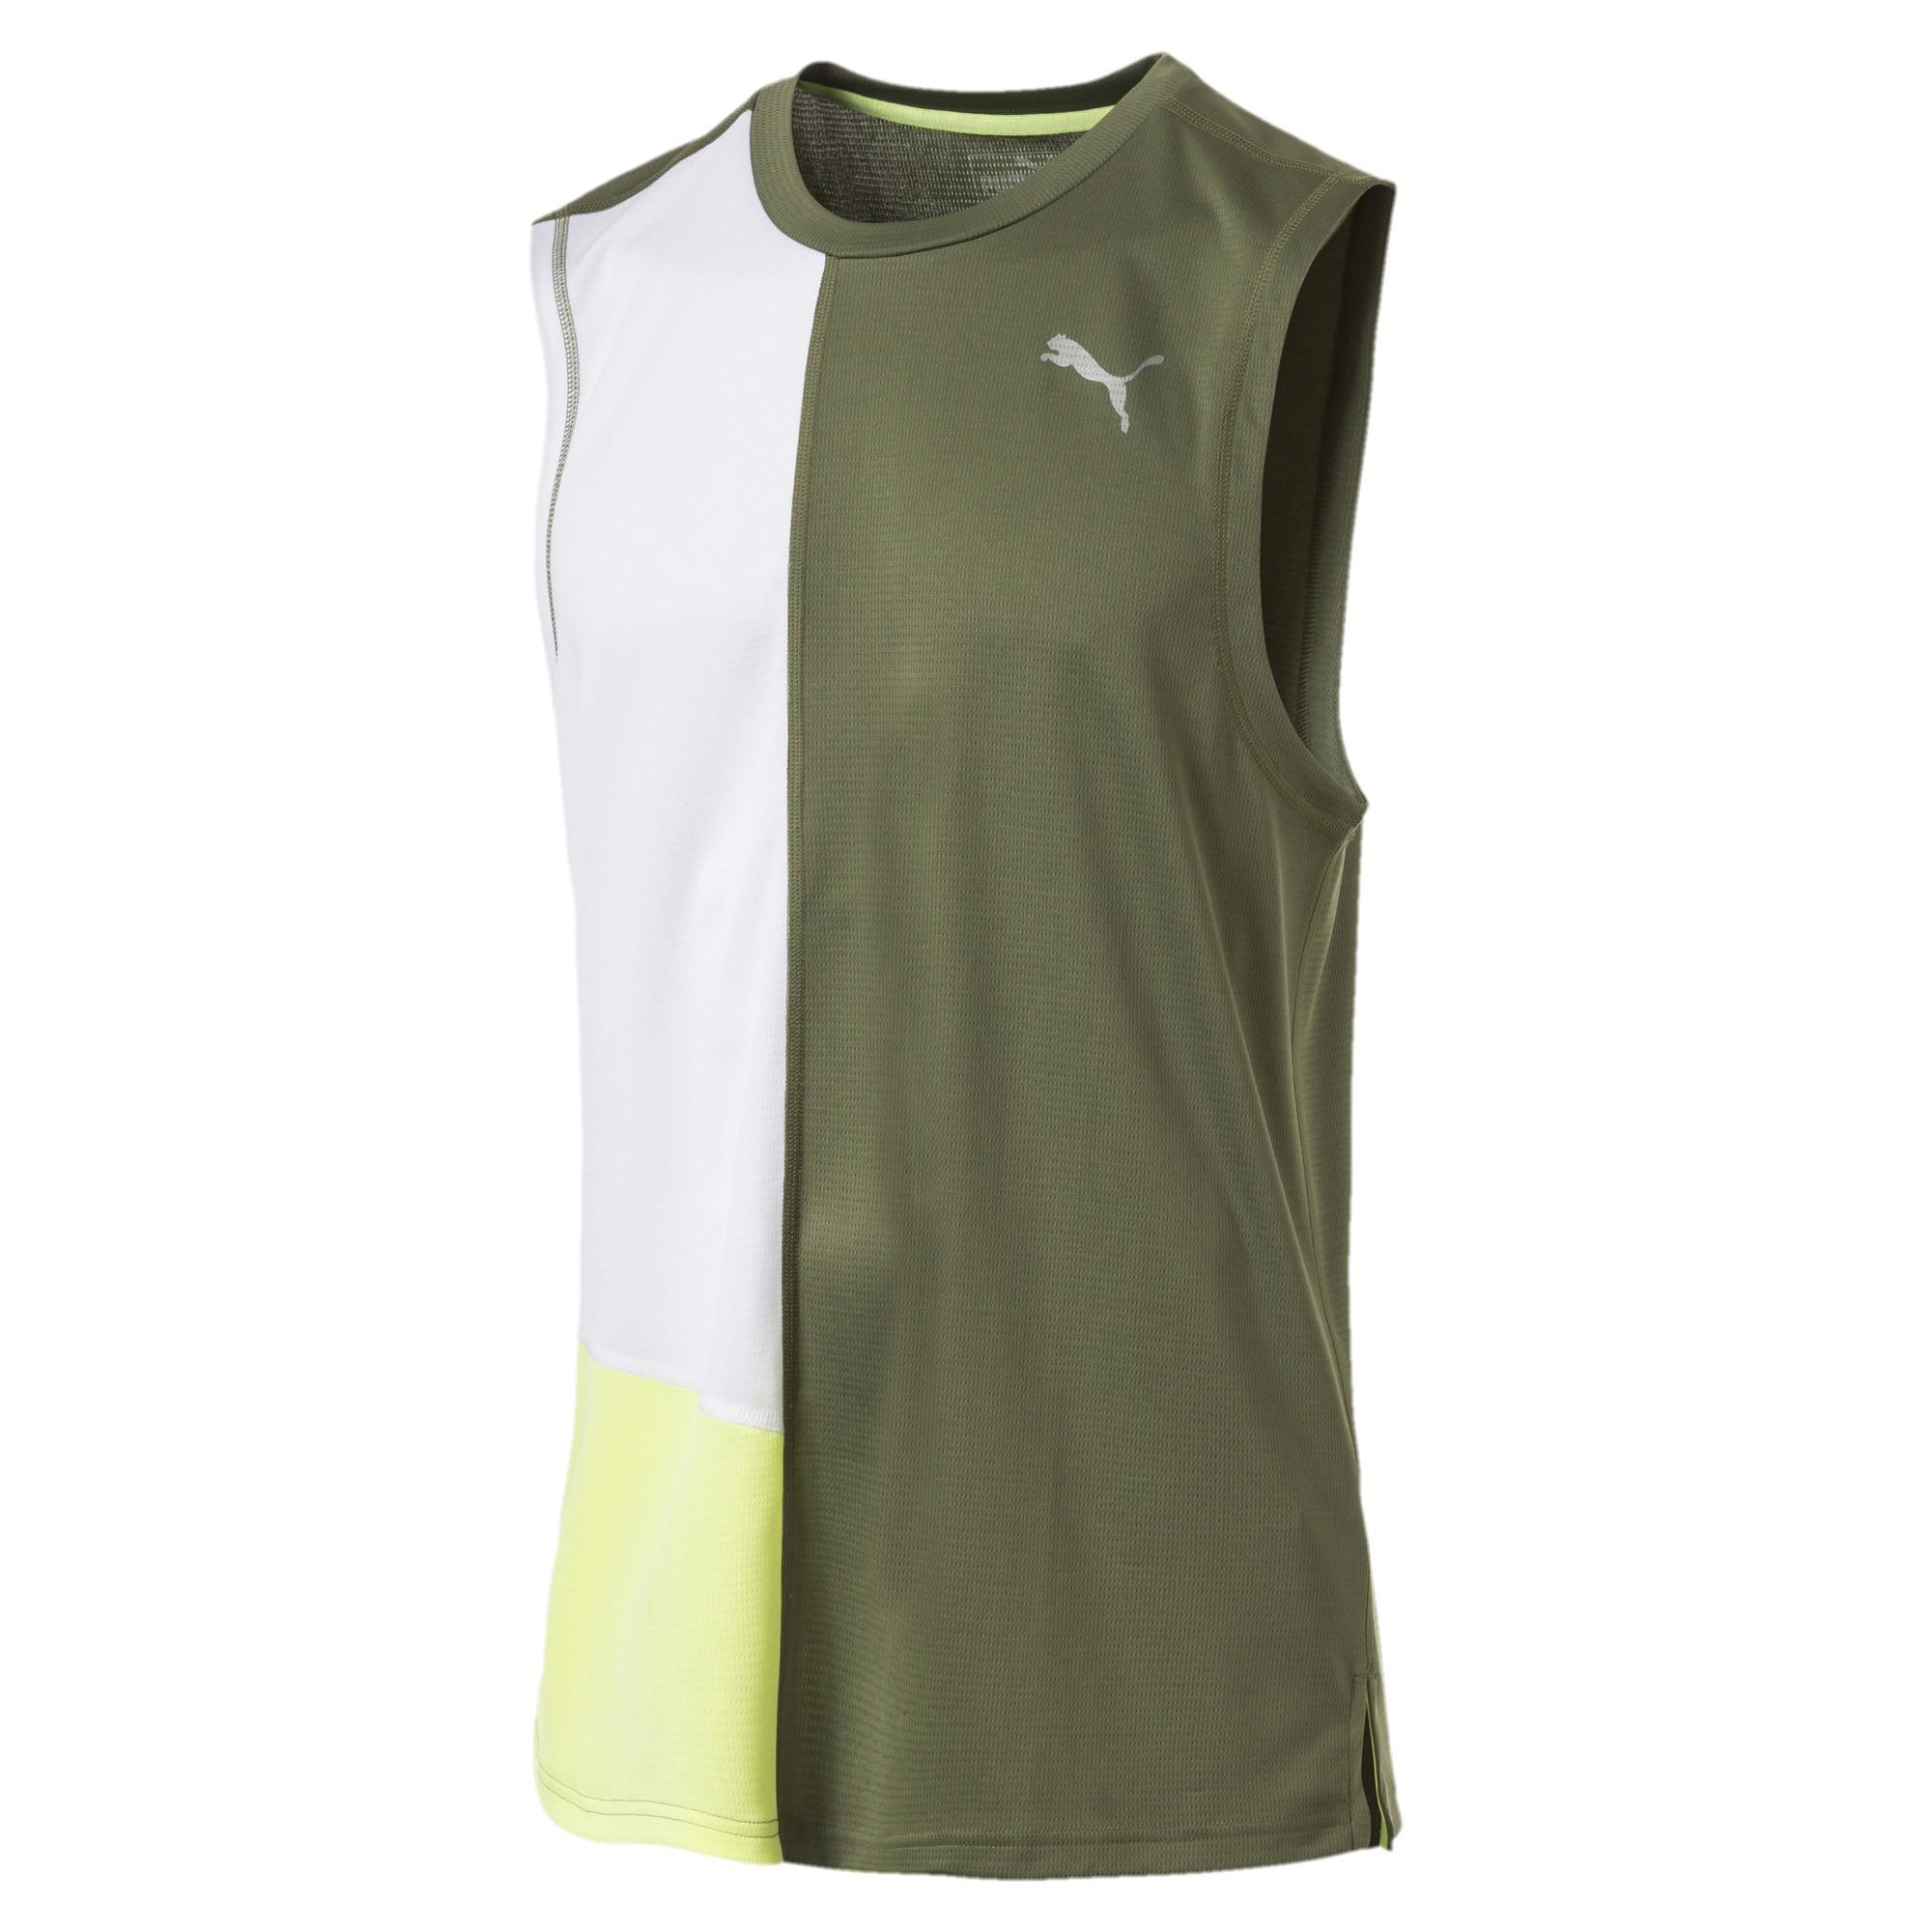 Tom Hanks Vest Tank Top Singlet Dress T-Shirt Mens Womens Ladies